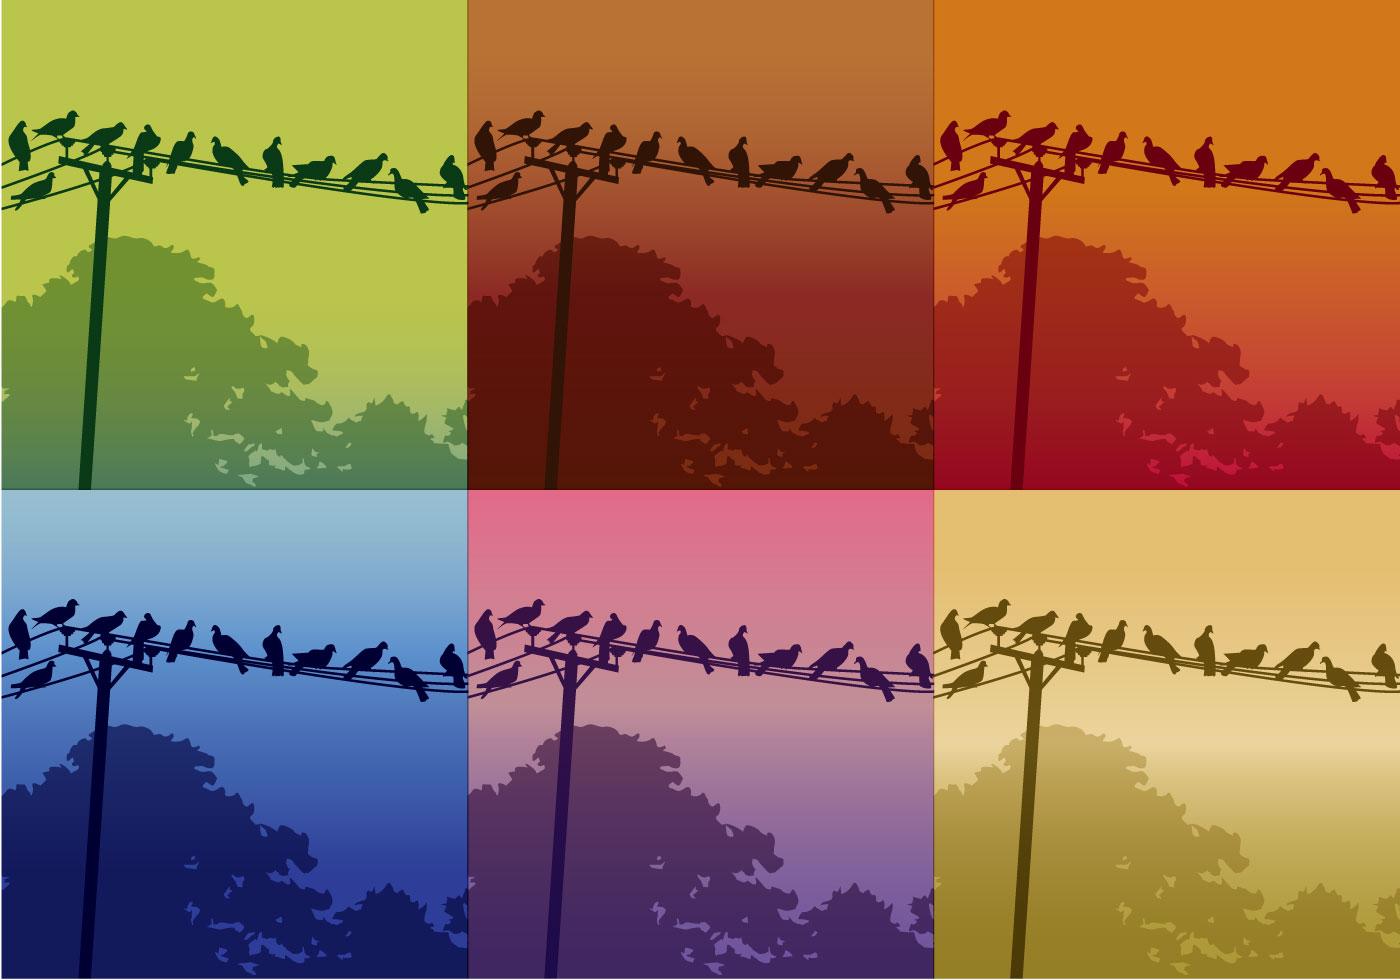 Birds On Telephone Lines - Download Free Vector Art, Stock ...